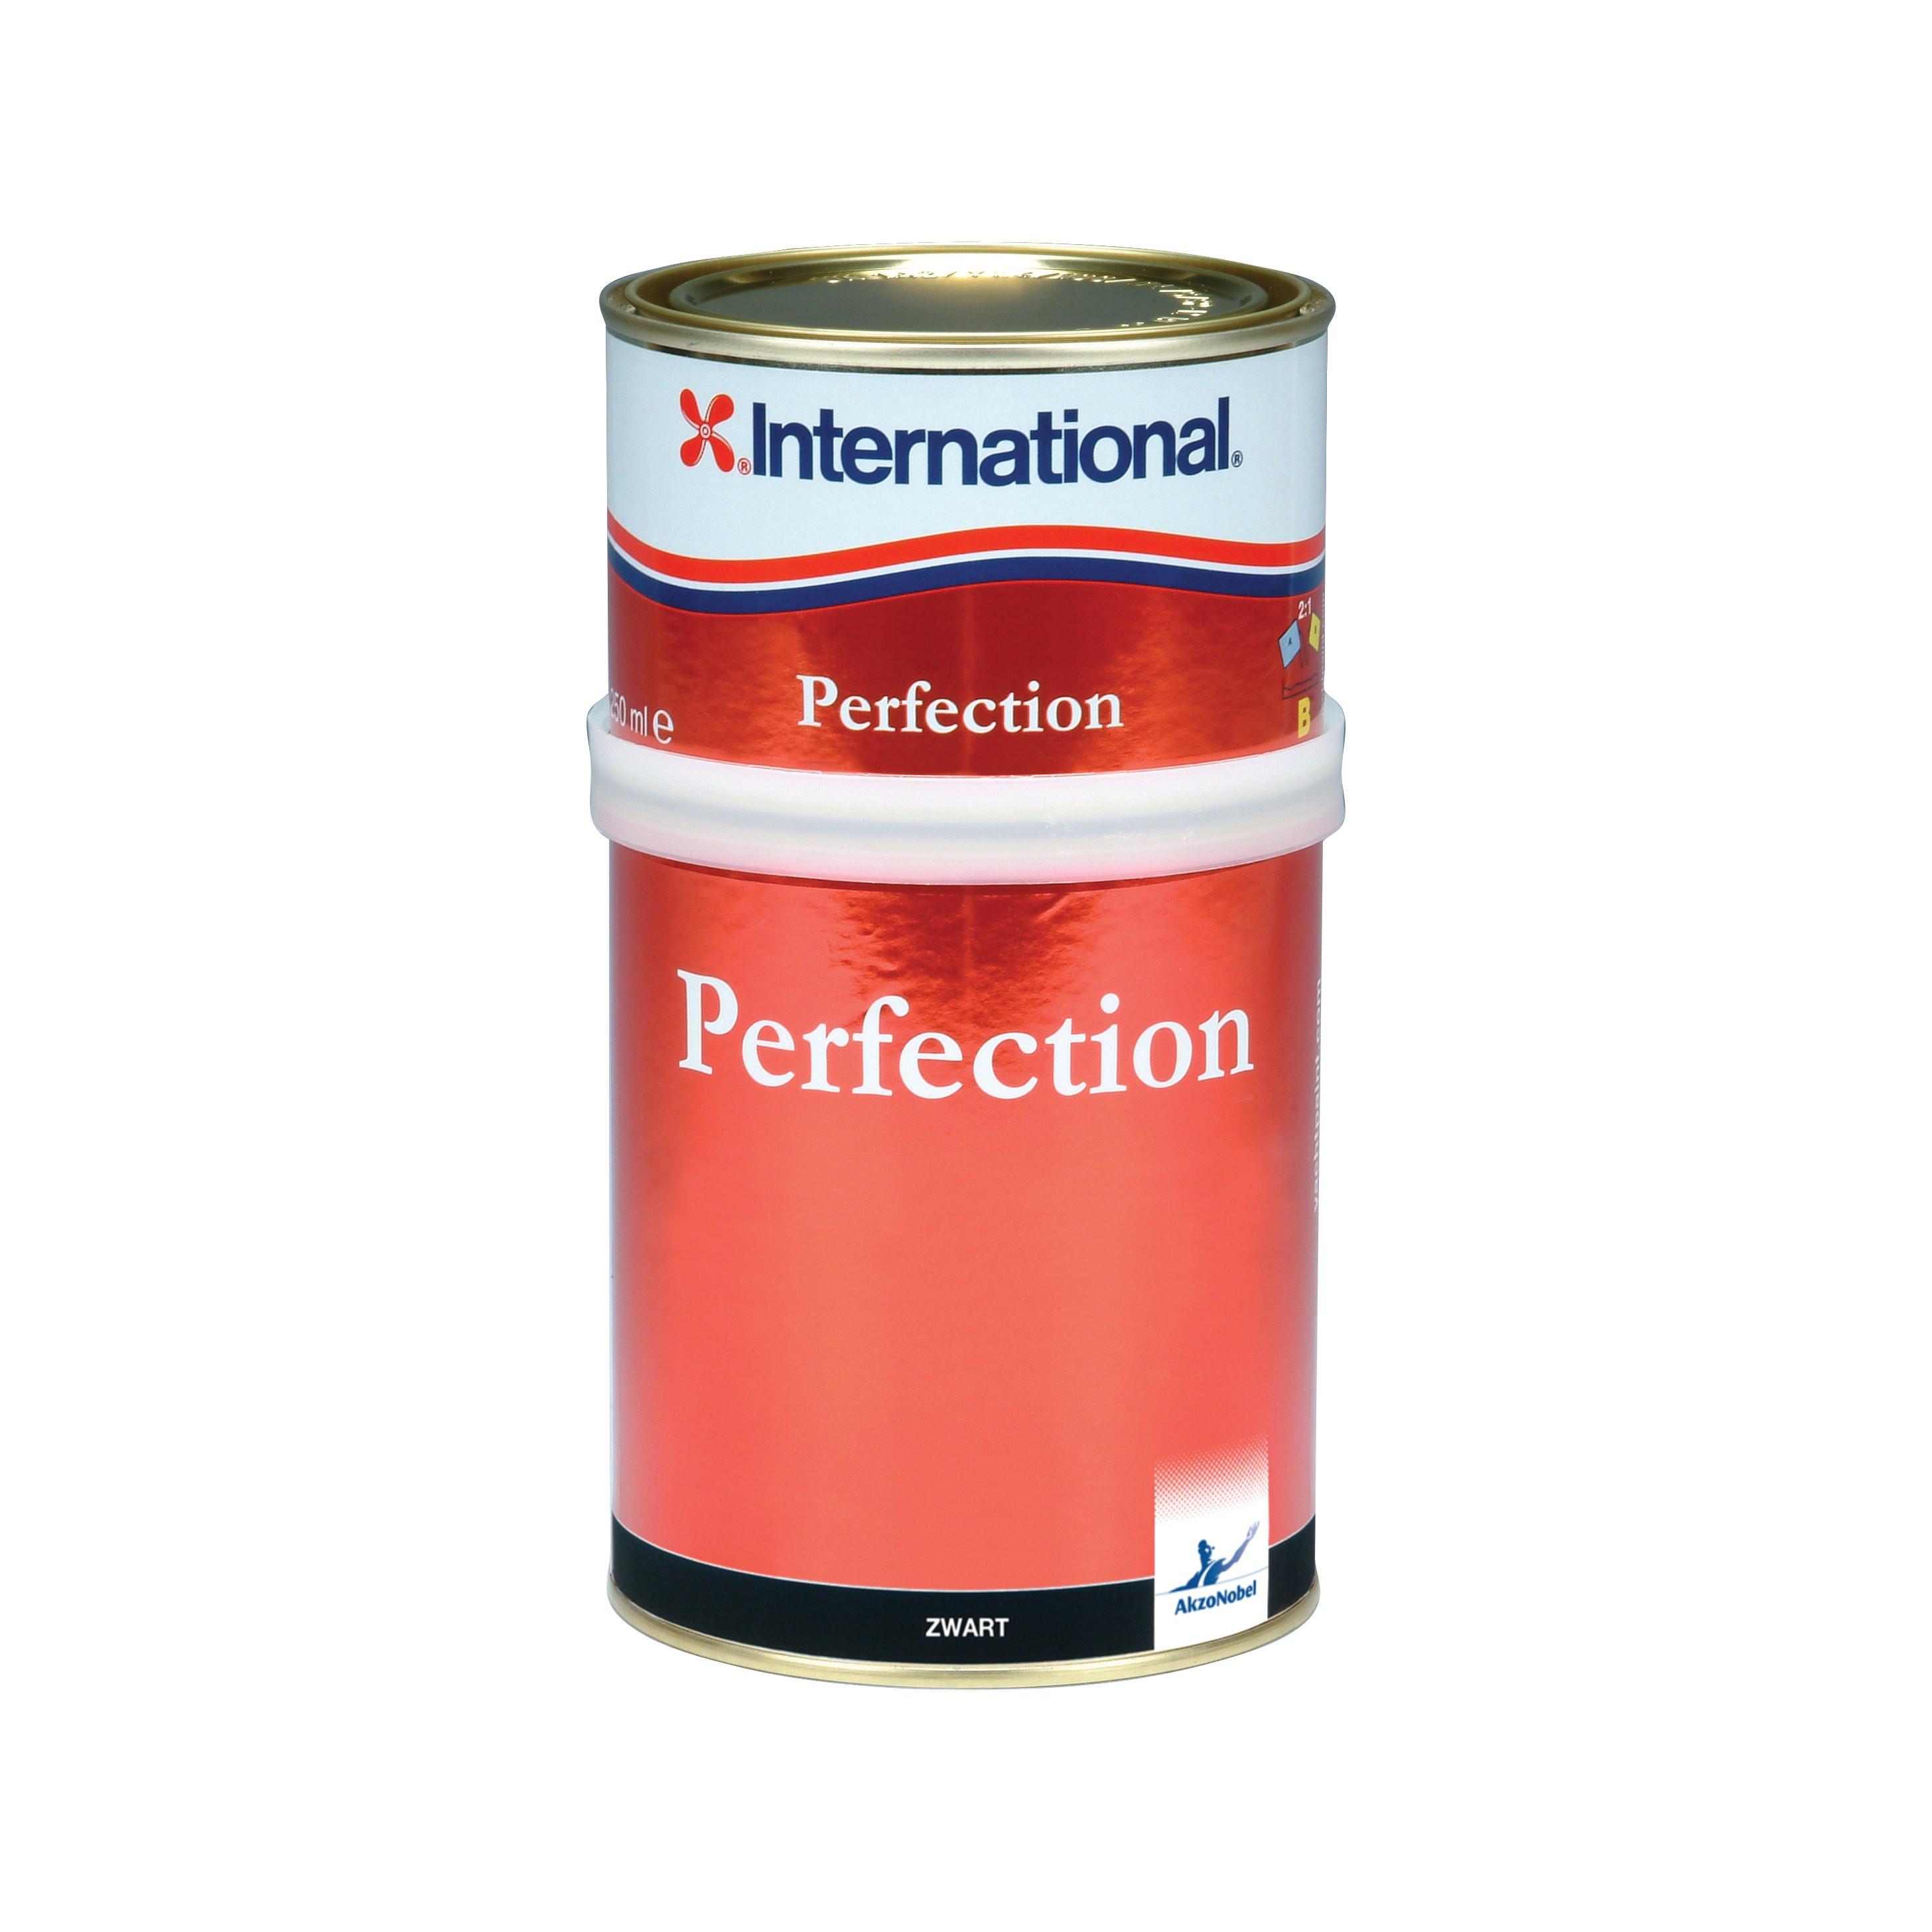 International Perfection aflak - blauw 936, 750ml